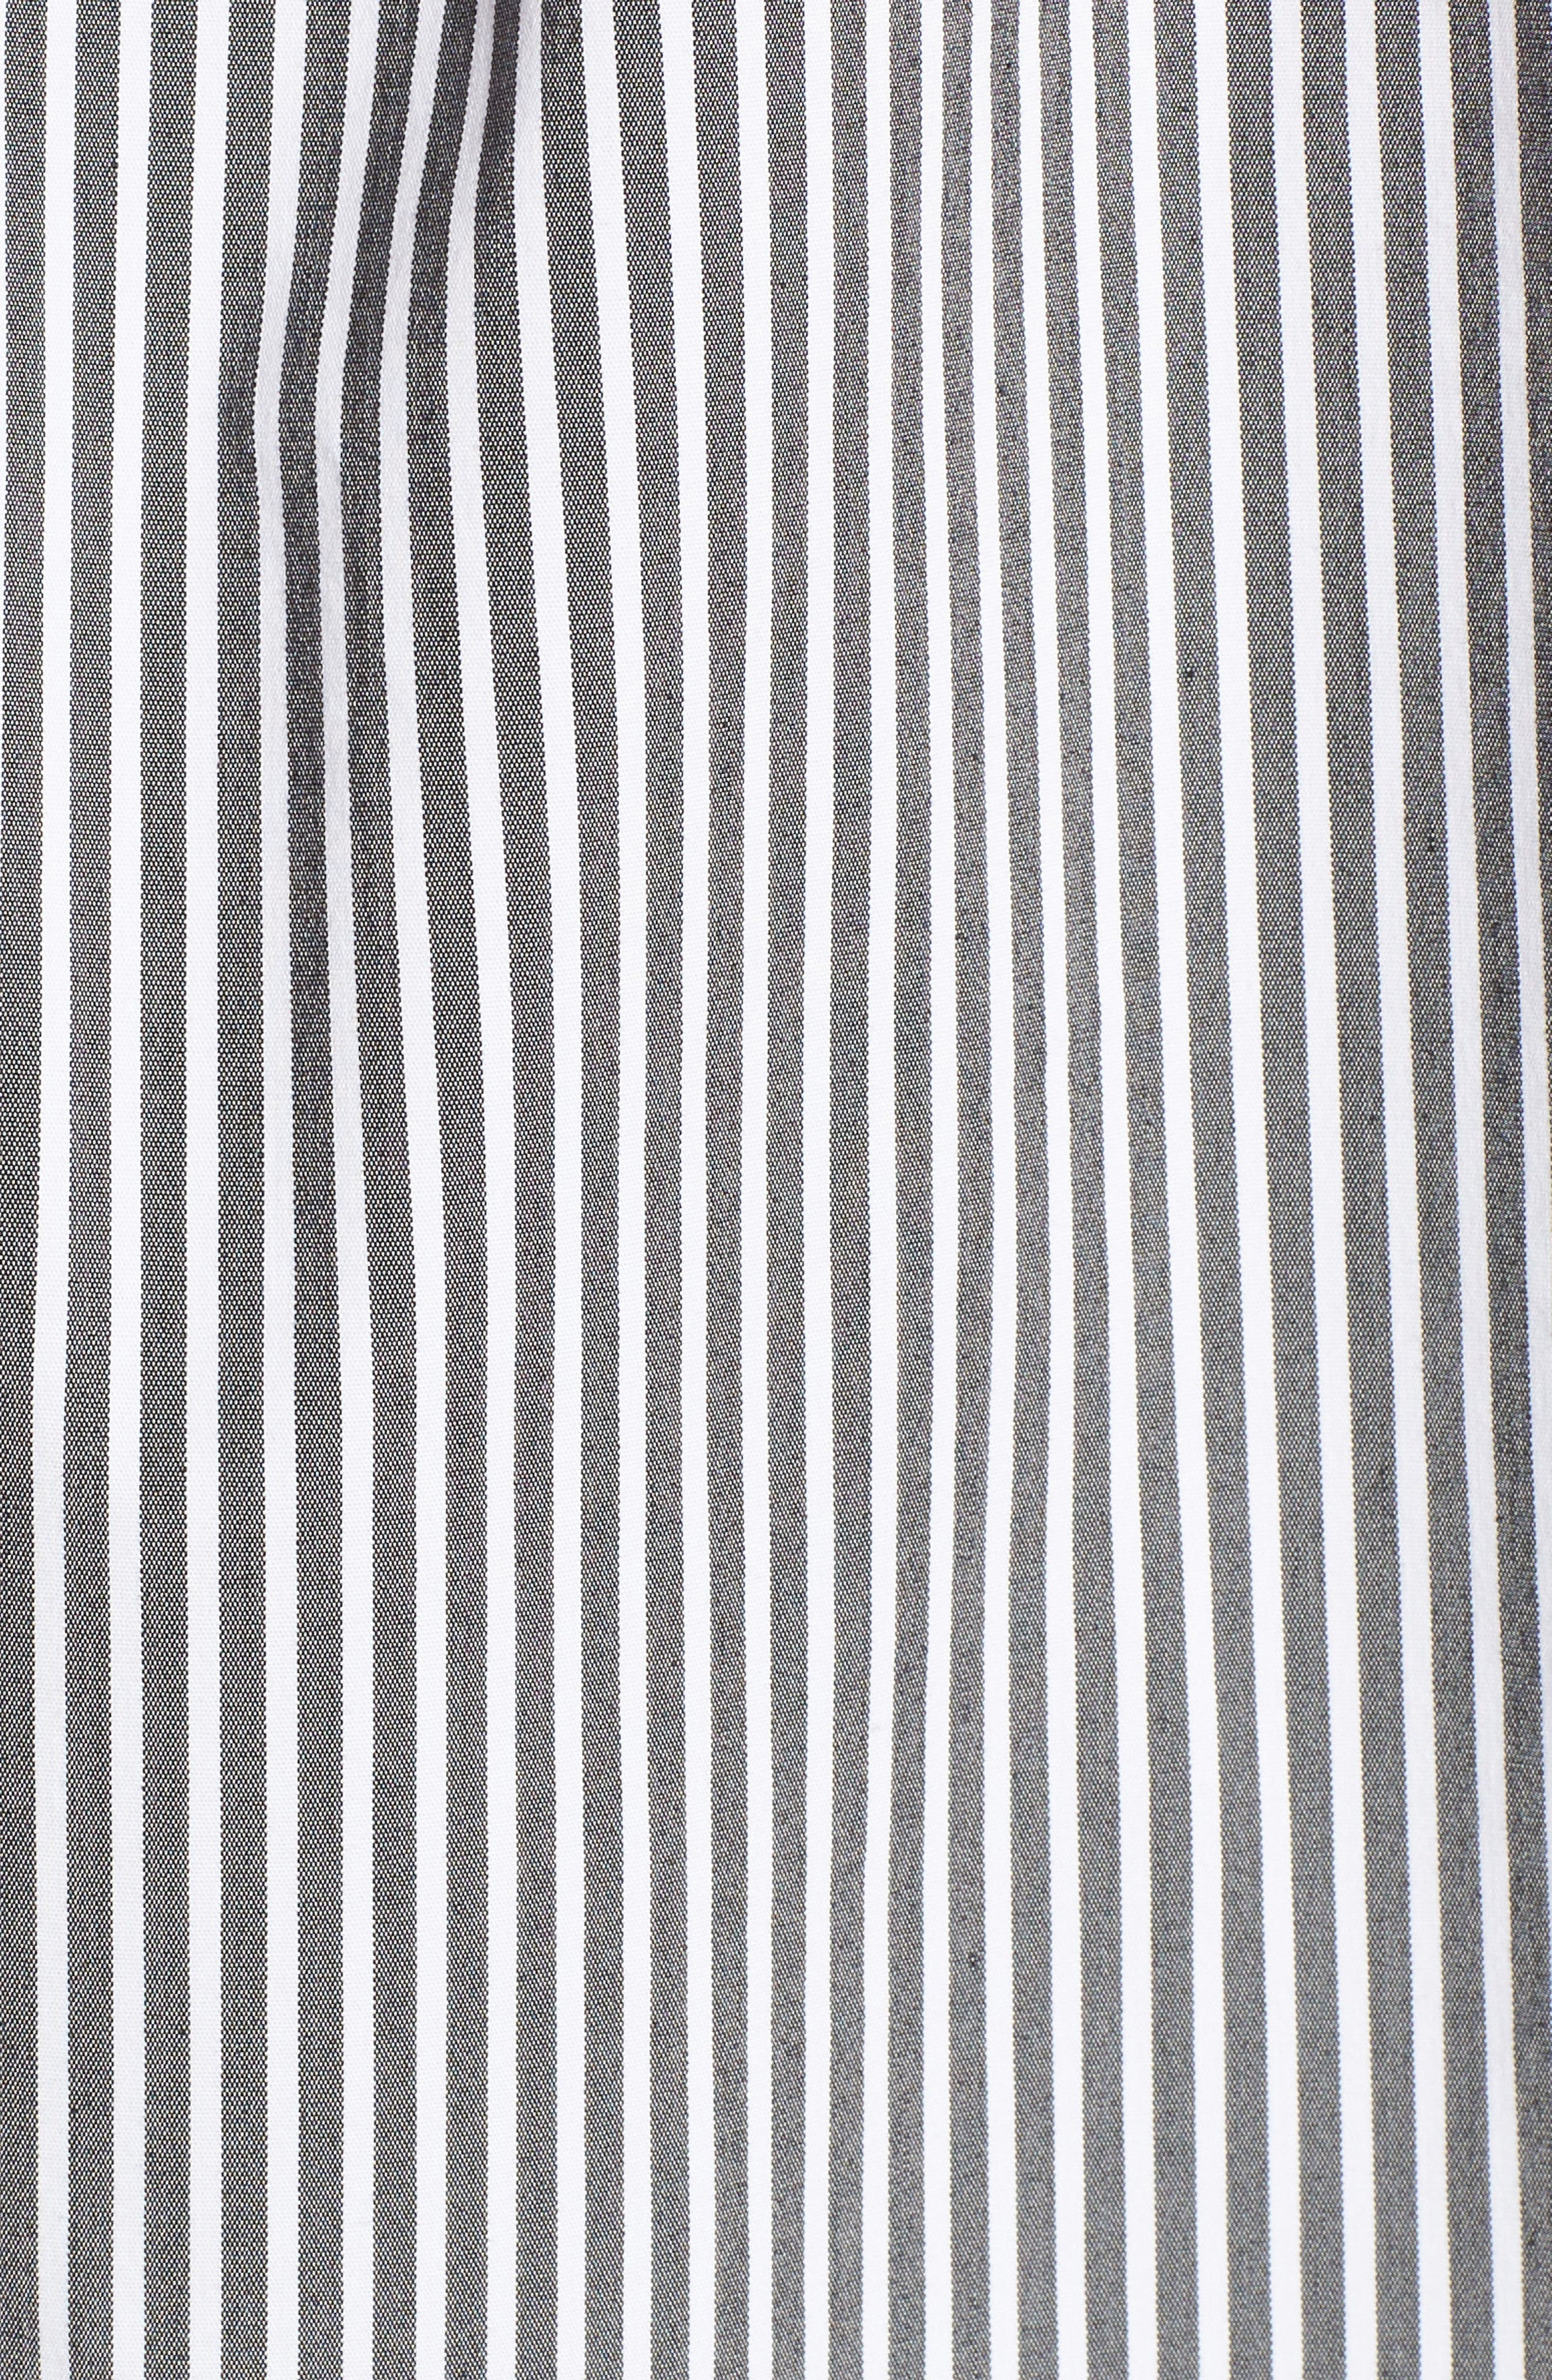 Ruffle One-Shoulder Blouse,                             Alternate thumbnail 5, color,                             006